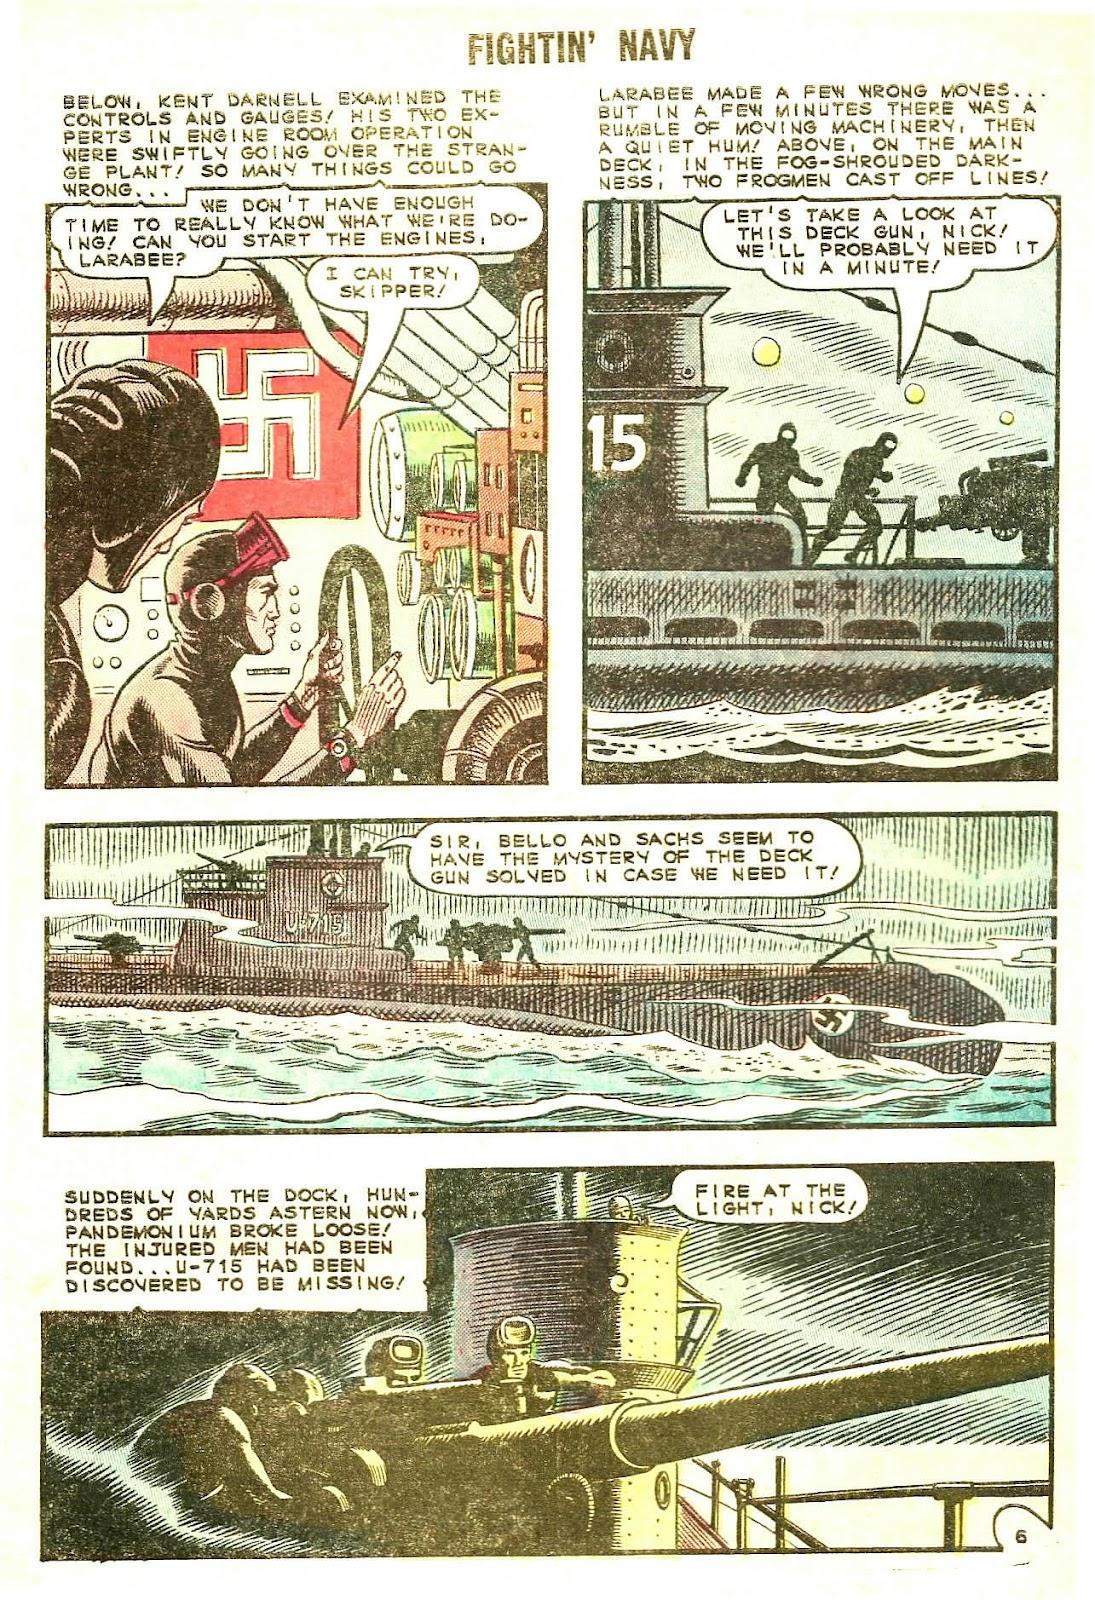 Read online Fightin' Navy comic -  Issue #120 - 32